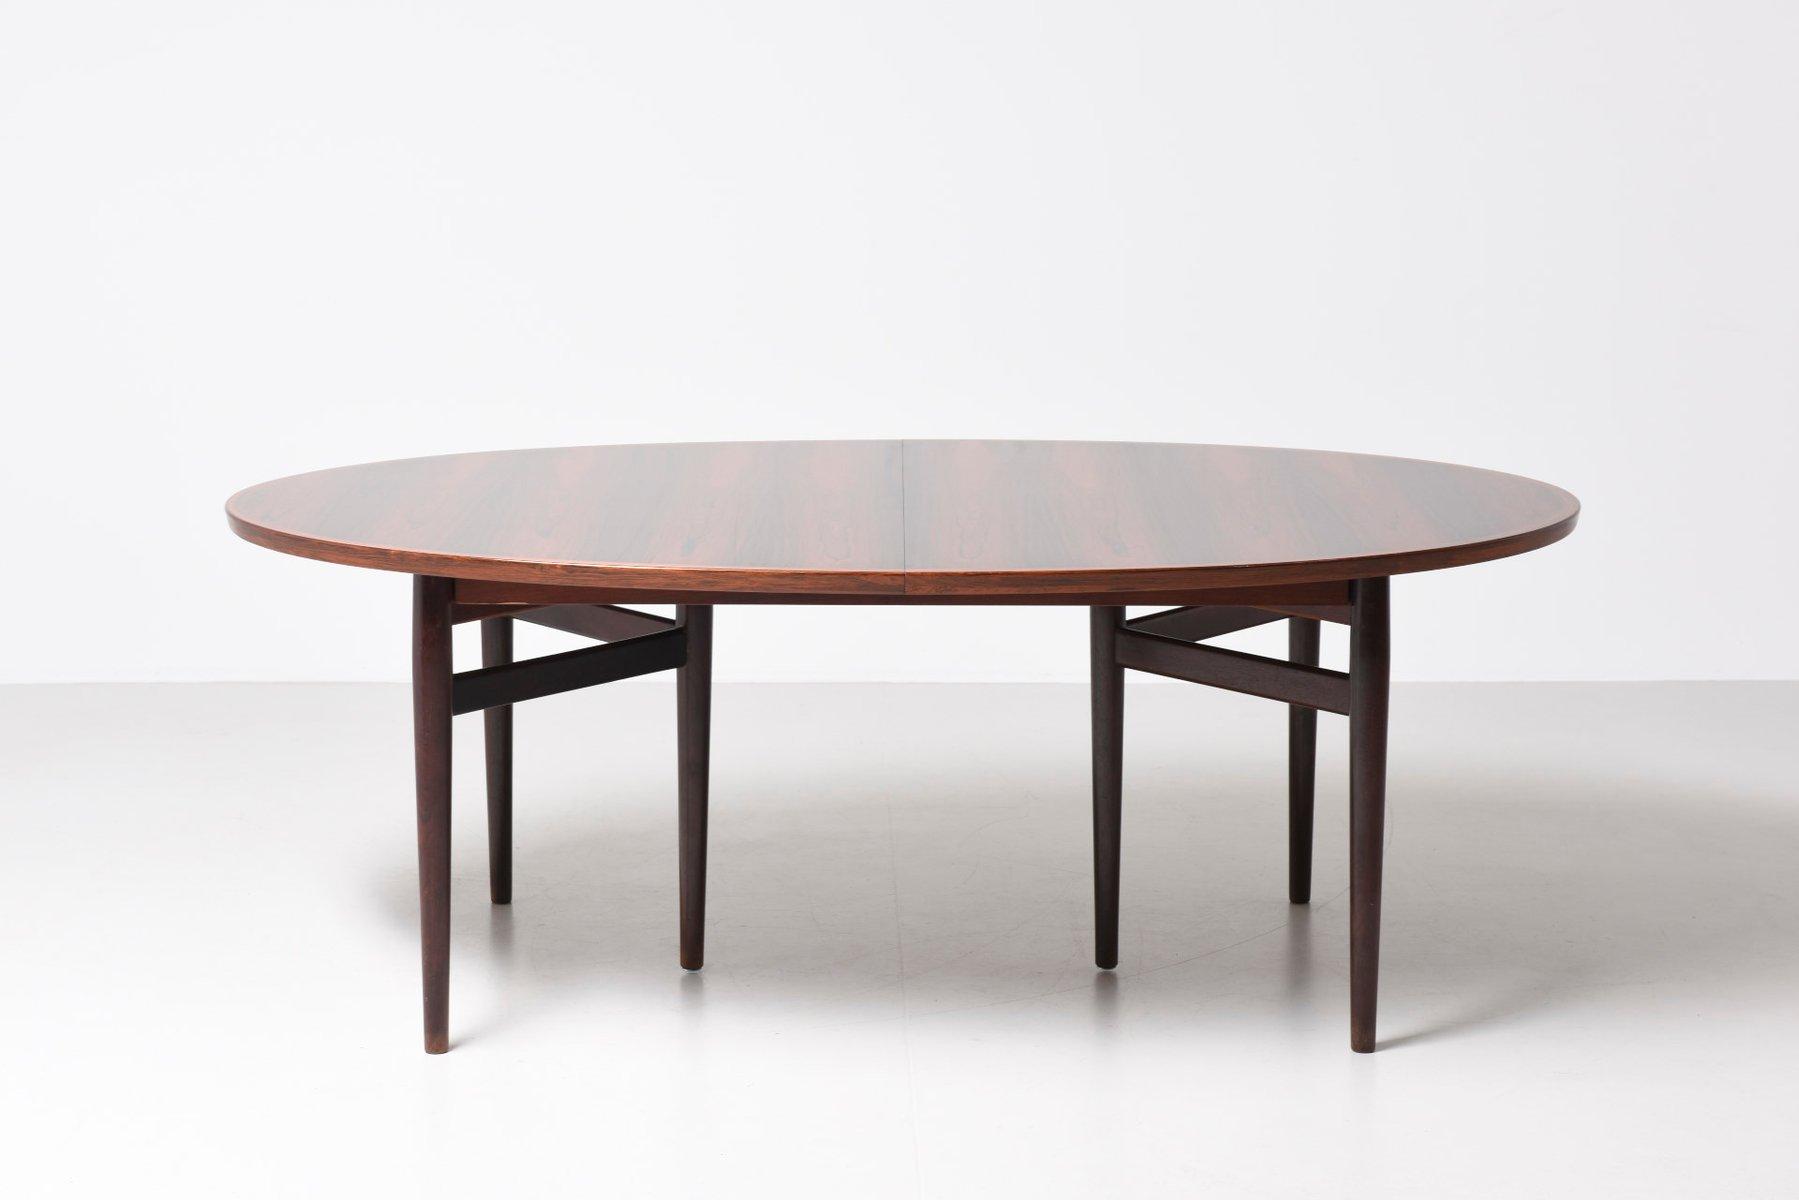 Table De Salle Manger 212 Mid Century Ovale Par Arne